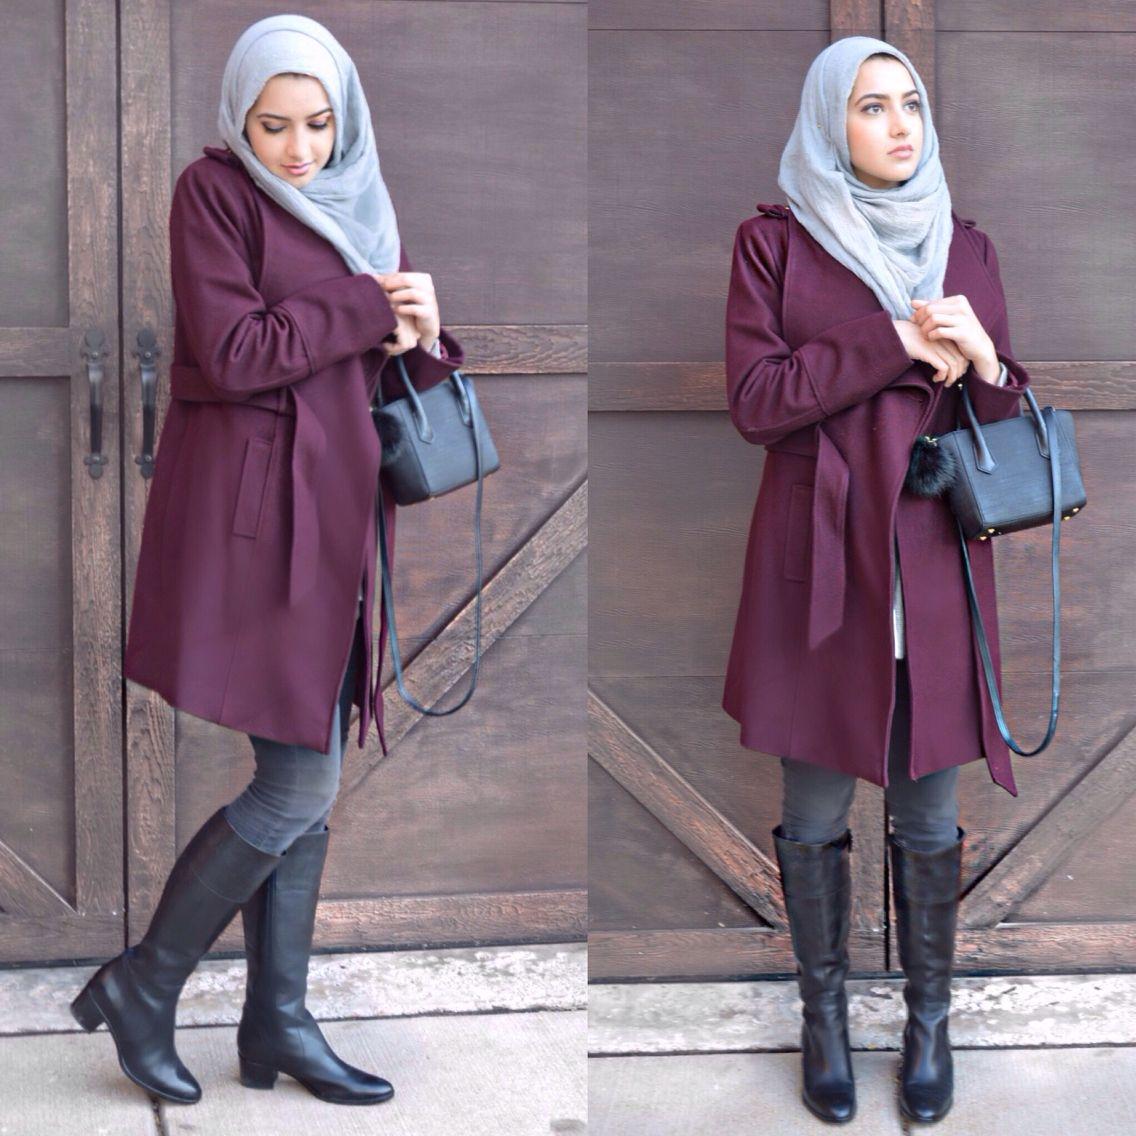 burgundy coat coats pinterest winter outfits hijab. Black Bedroom Furniture Sets. Home Design Ideas